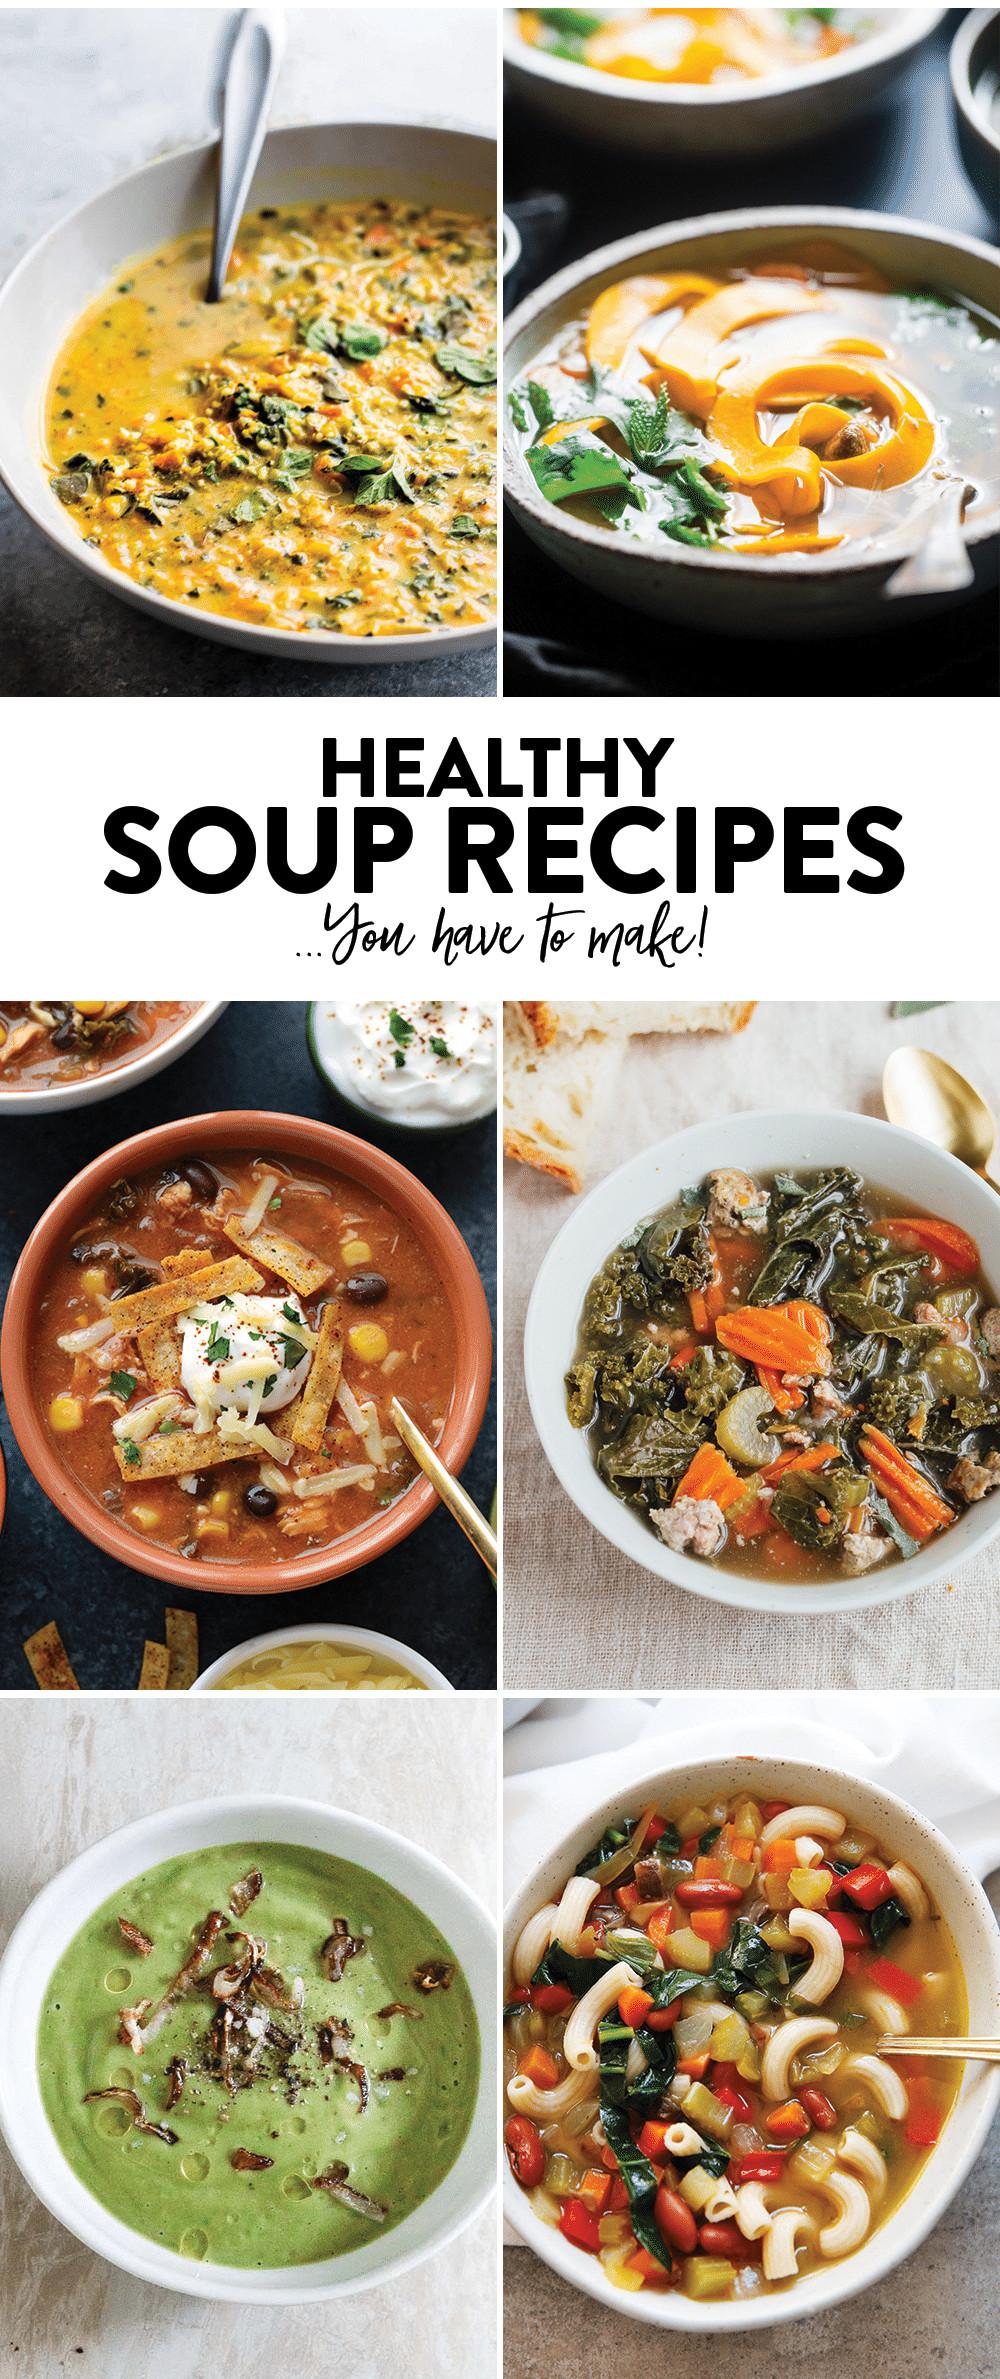 Healthy Soups To Make  Curried Cauliflower Rice Kale Soup Paleo Vegan